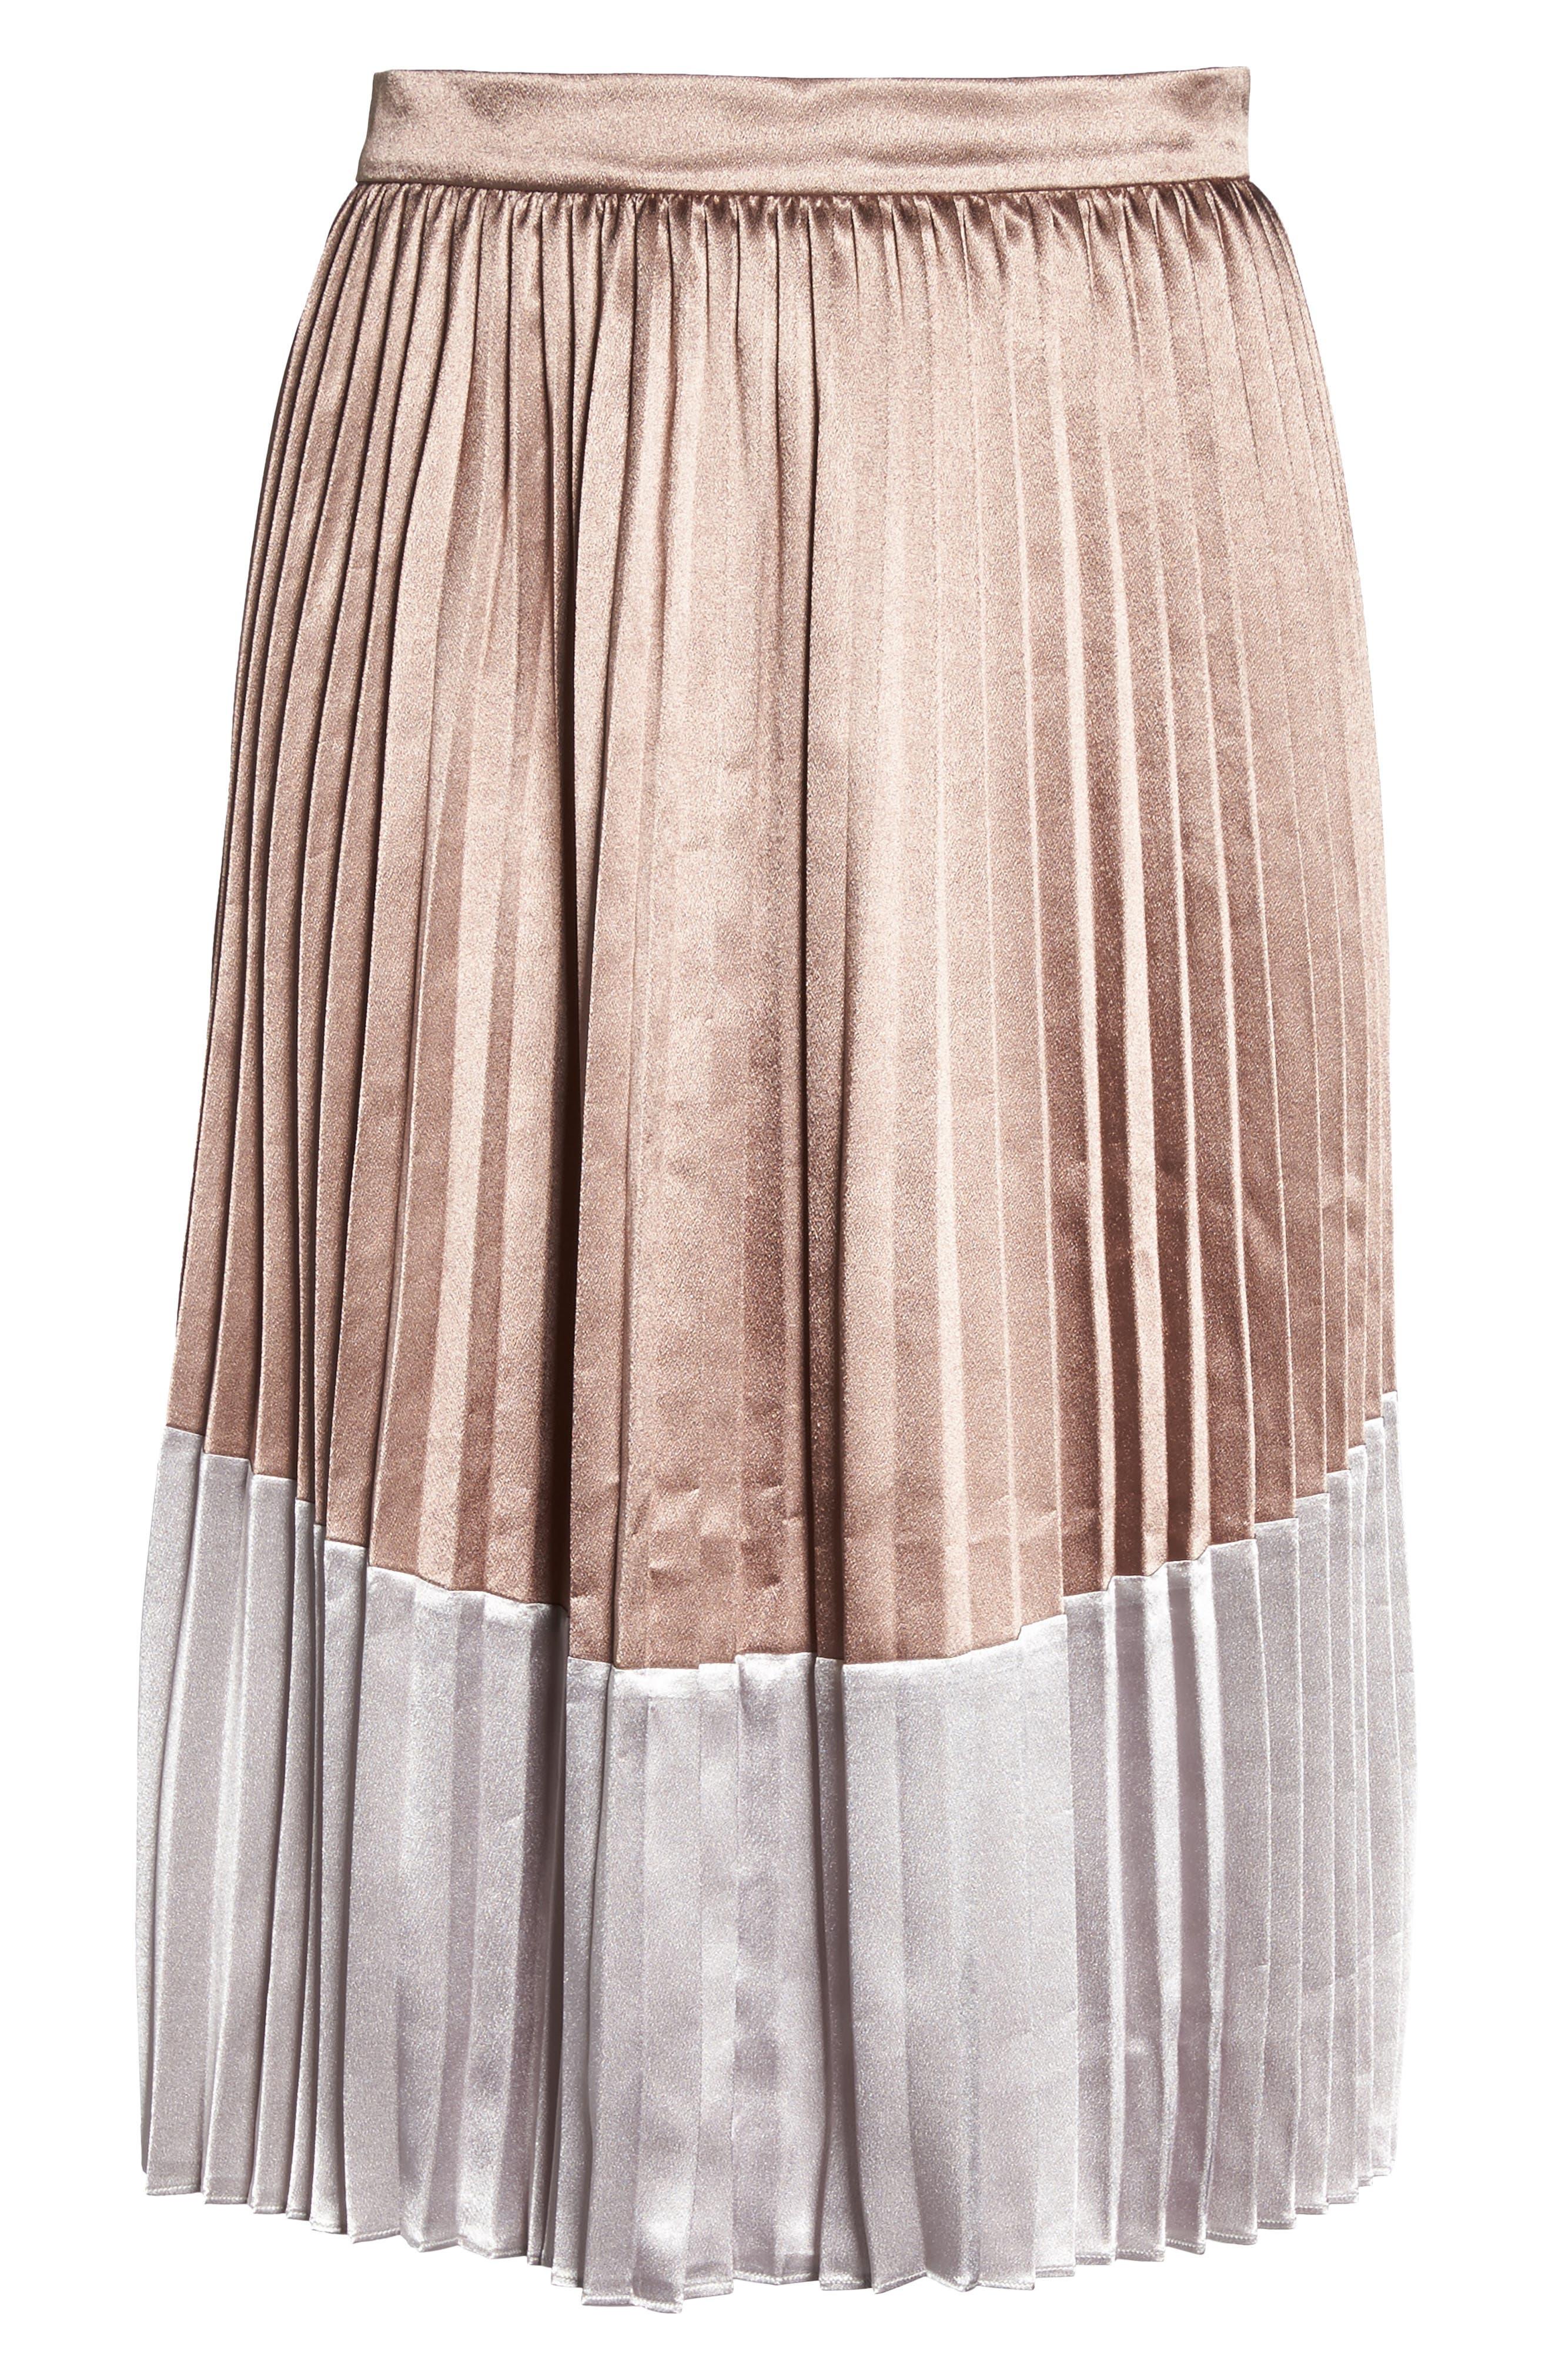 Pleat Metallic Skirt,                             Alternate thumbnail 6, color,                             650